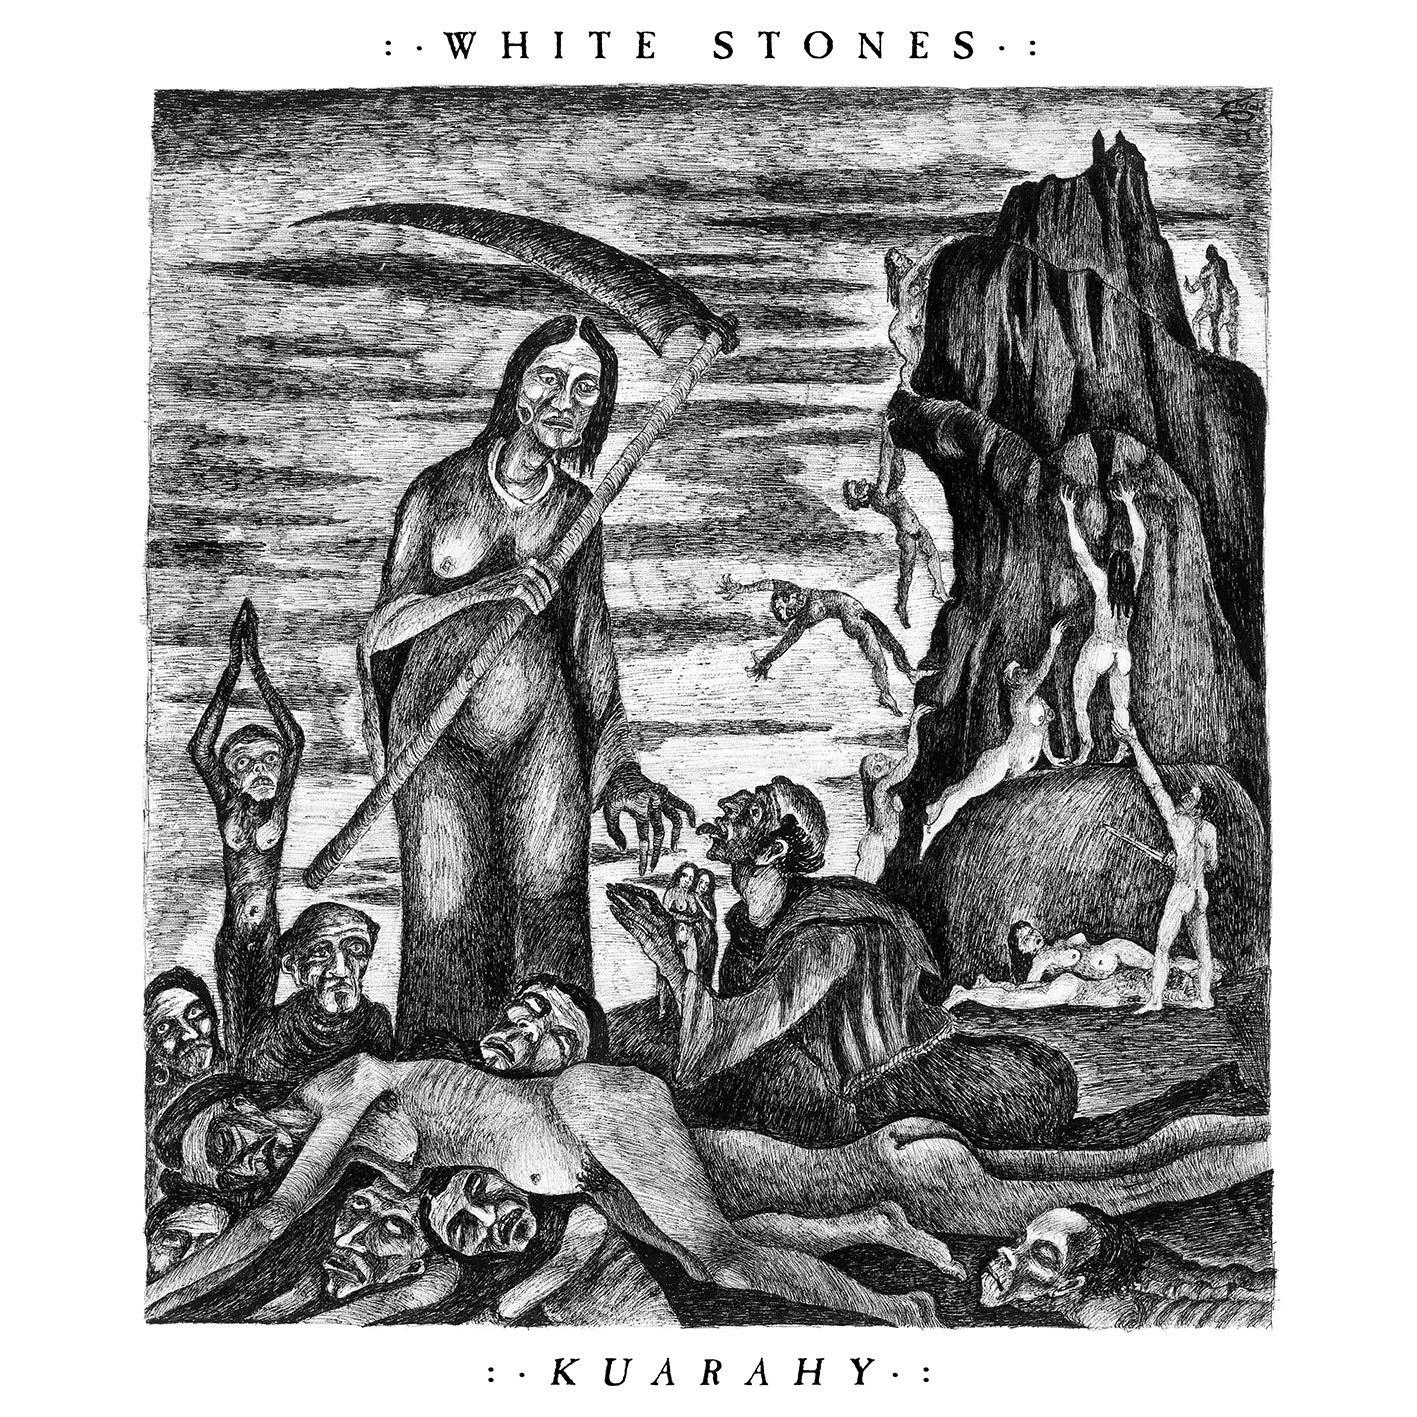 WHITE STONES - KUARAHY (CD)